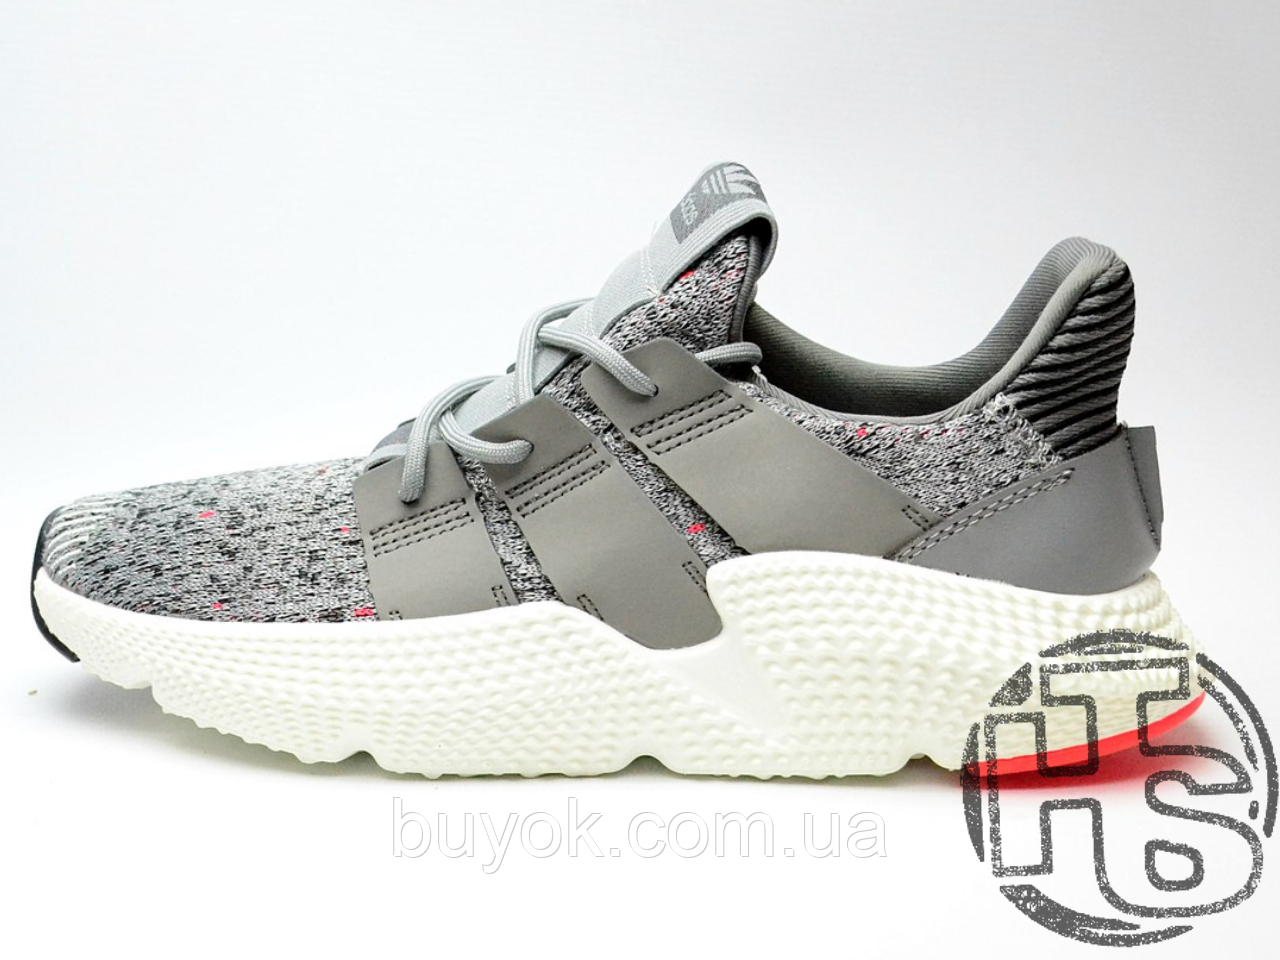 Чоловічі кросівки Adidas Prophere Refill Pack Grey/White CQ3023